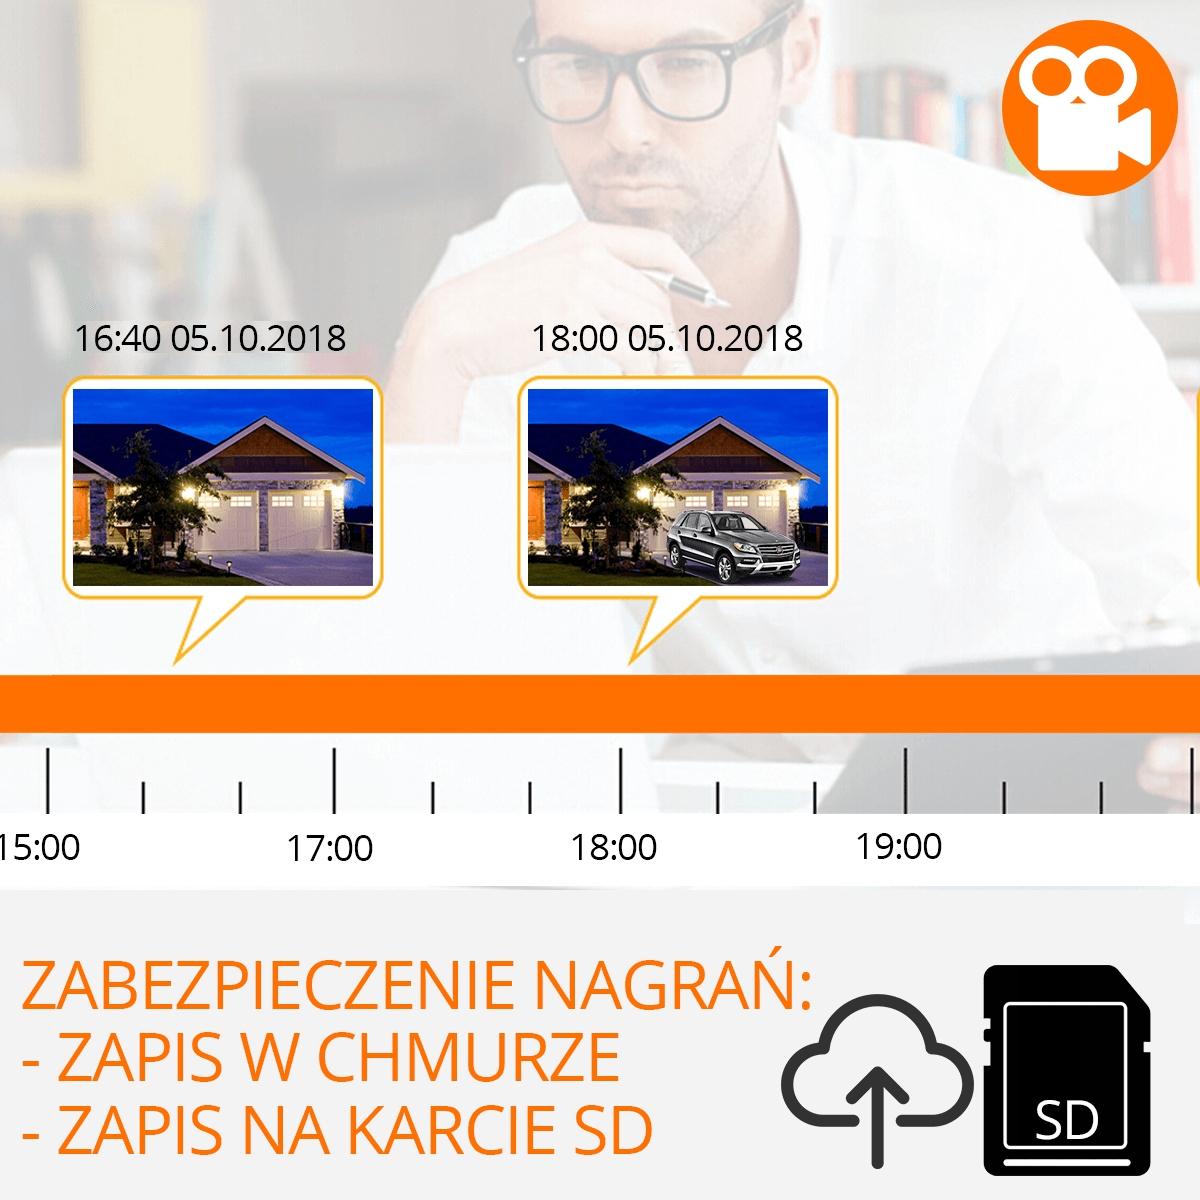 Kamera HD GSM SIM +Power Bank LG 3G 4G LTE ORLLO Obudowa inna